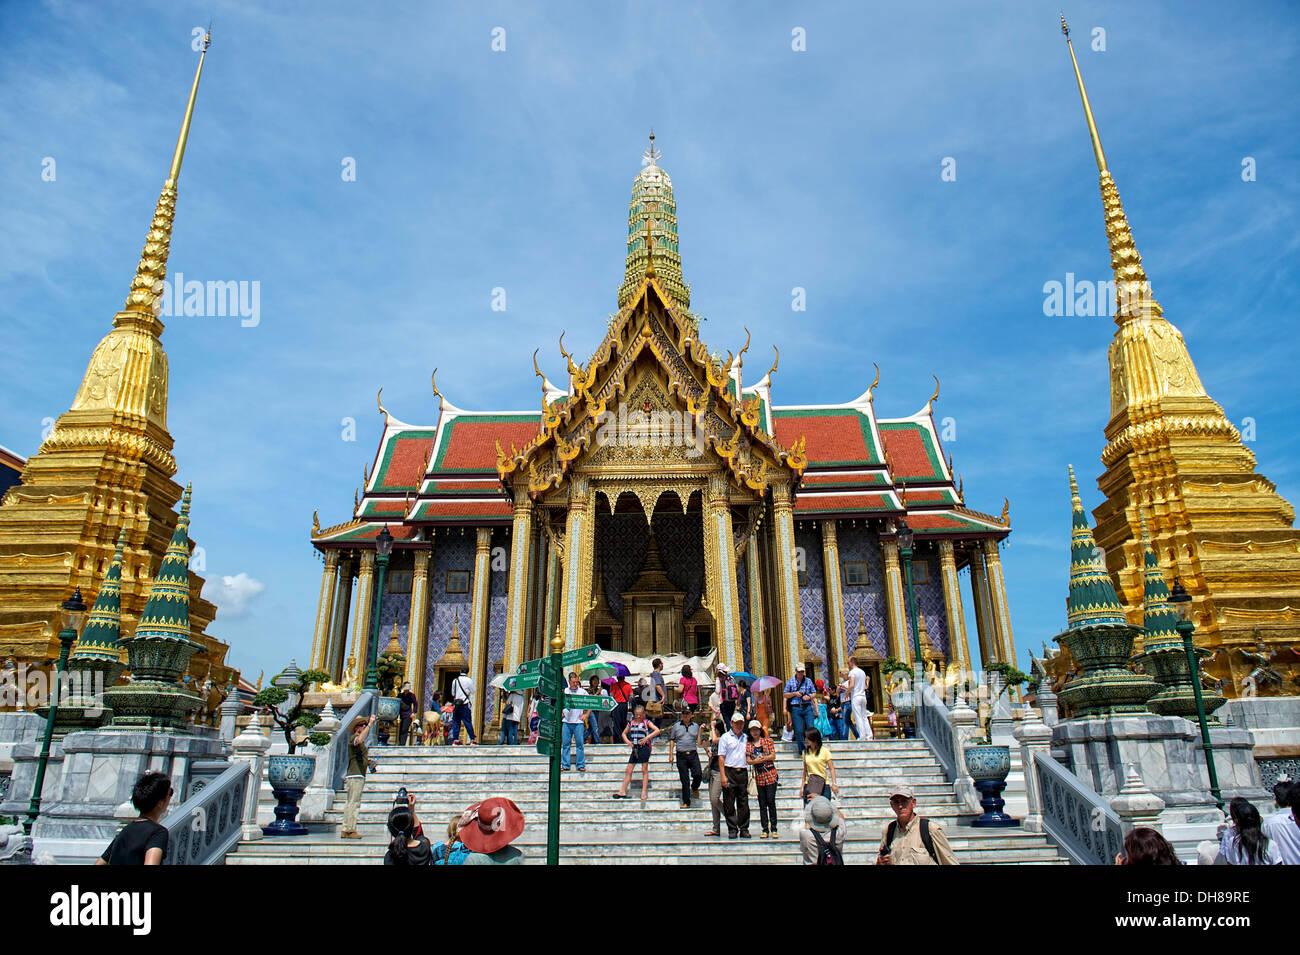 Prasat Phra Dhepbidorn Wat Pho Wat Phra Chetuphon Temple of the Reclining Buddha Bangkok Thailand Asia & Prasat Phra Dhepbidorn Wat Pho Wat Phra Chetuphon Temple of the ... islam-shia.org